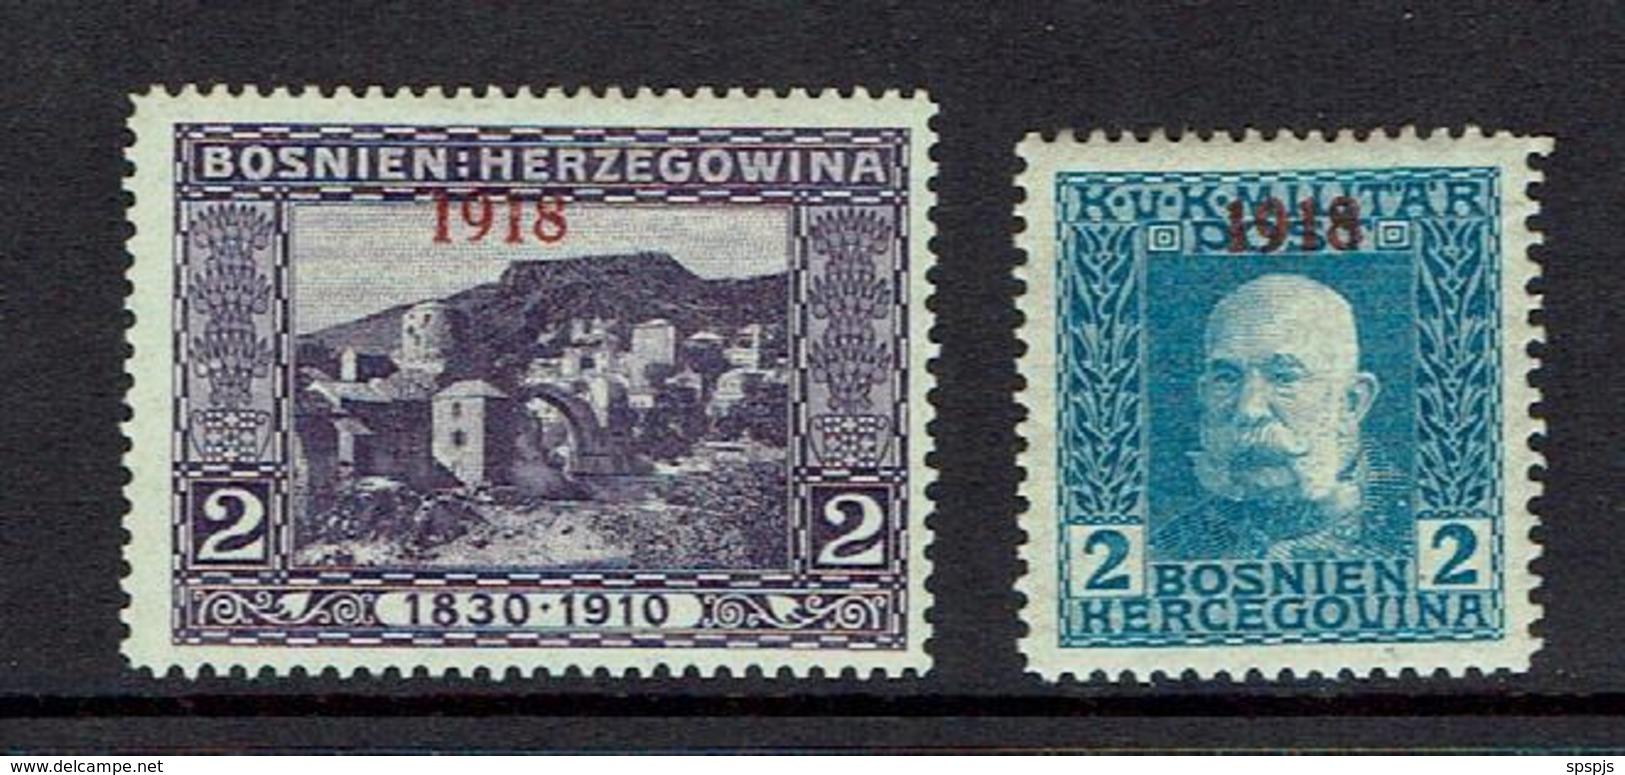 BOSNIA AND HERZEGOVINA...mh...1918 - Bosnia And Herzegovina